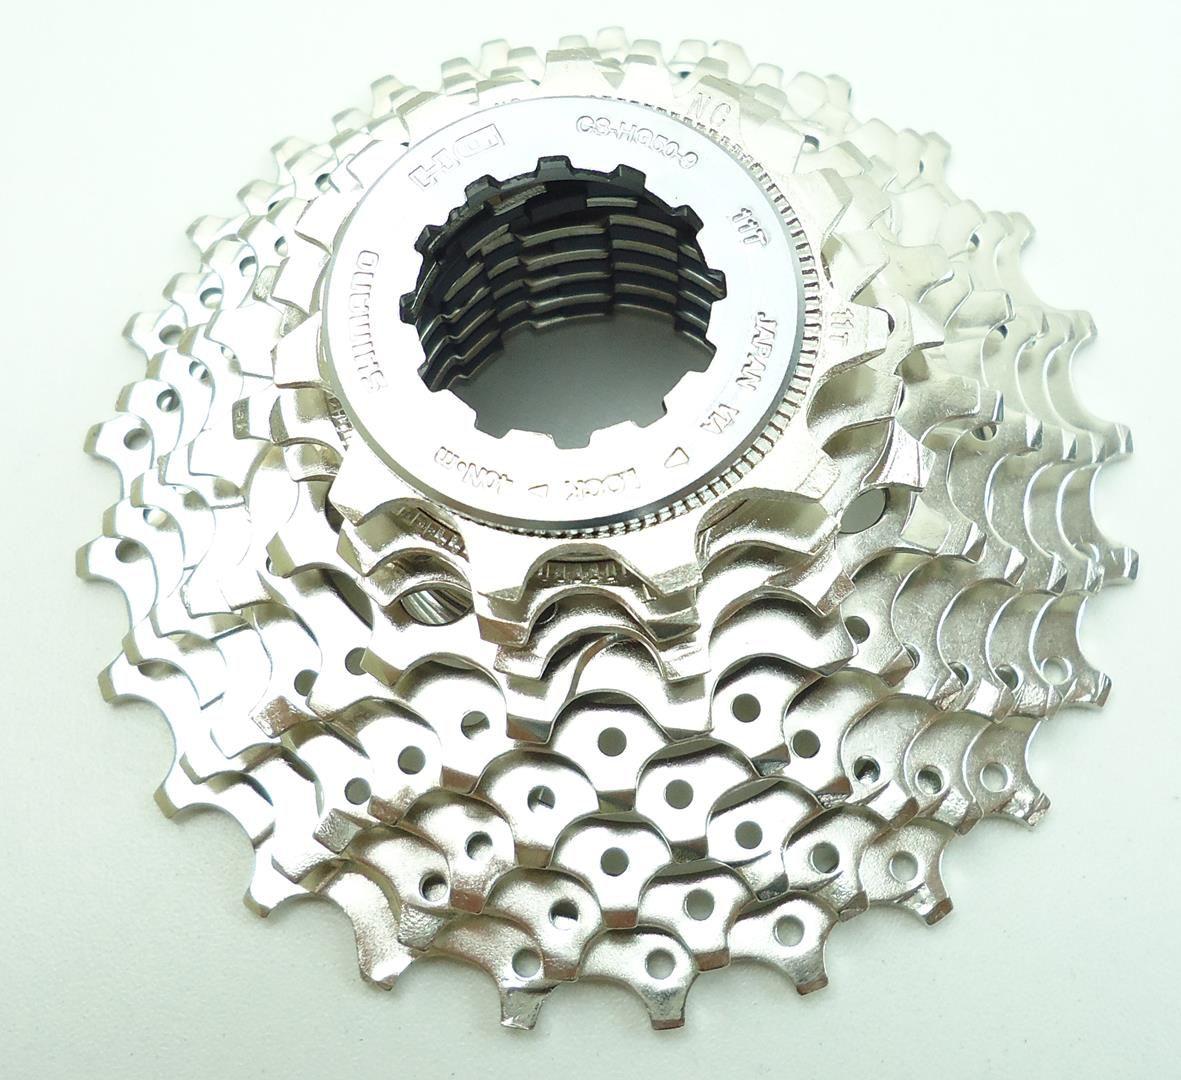 Cassete Bicicleta Speed Shimano Sora 11-25 HG50-9 9 Velocidades Road